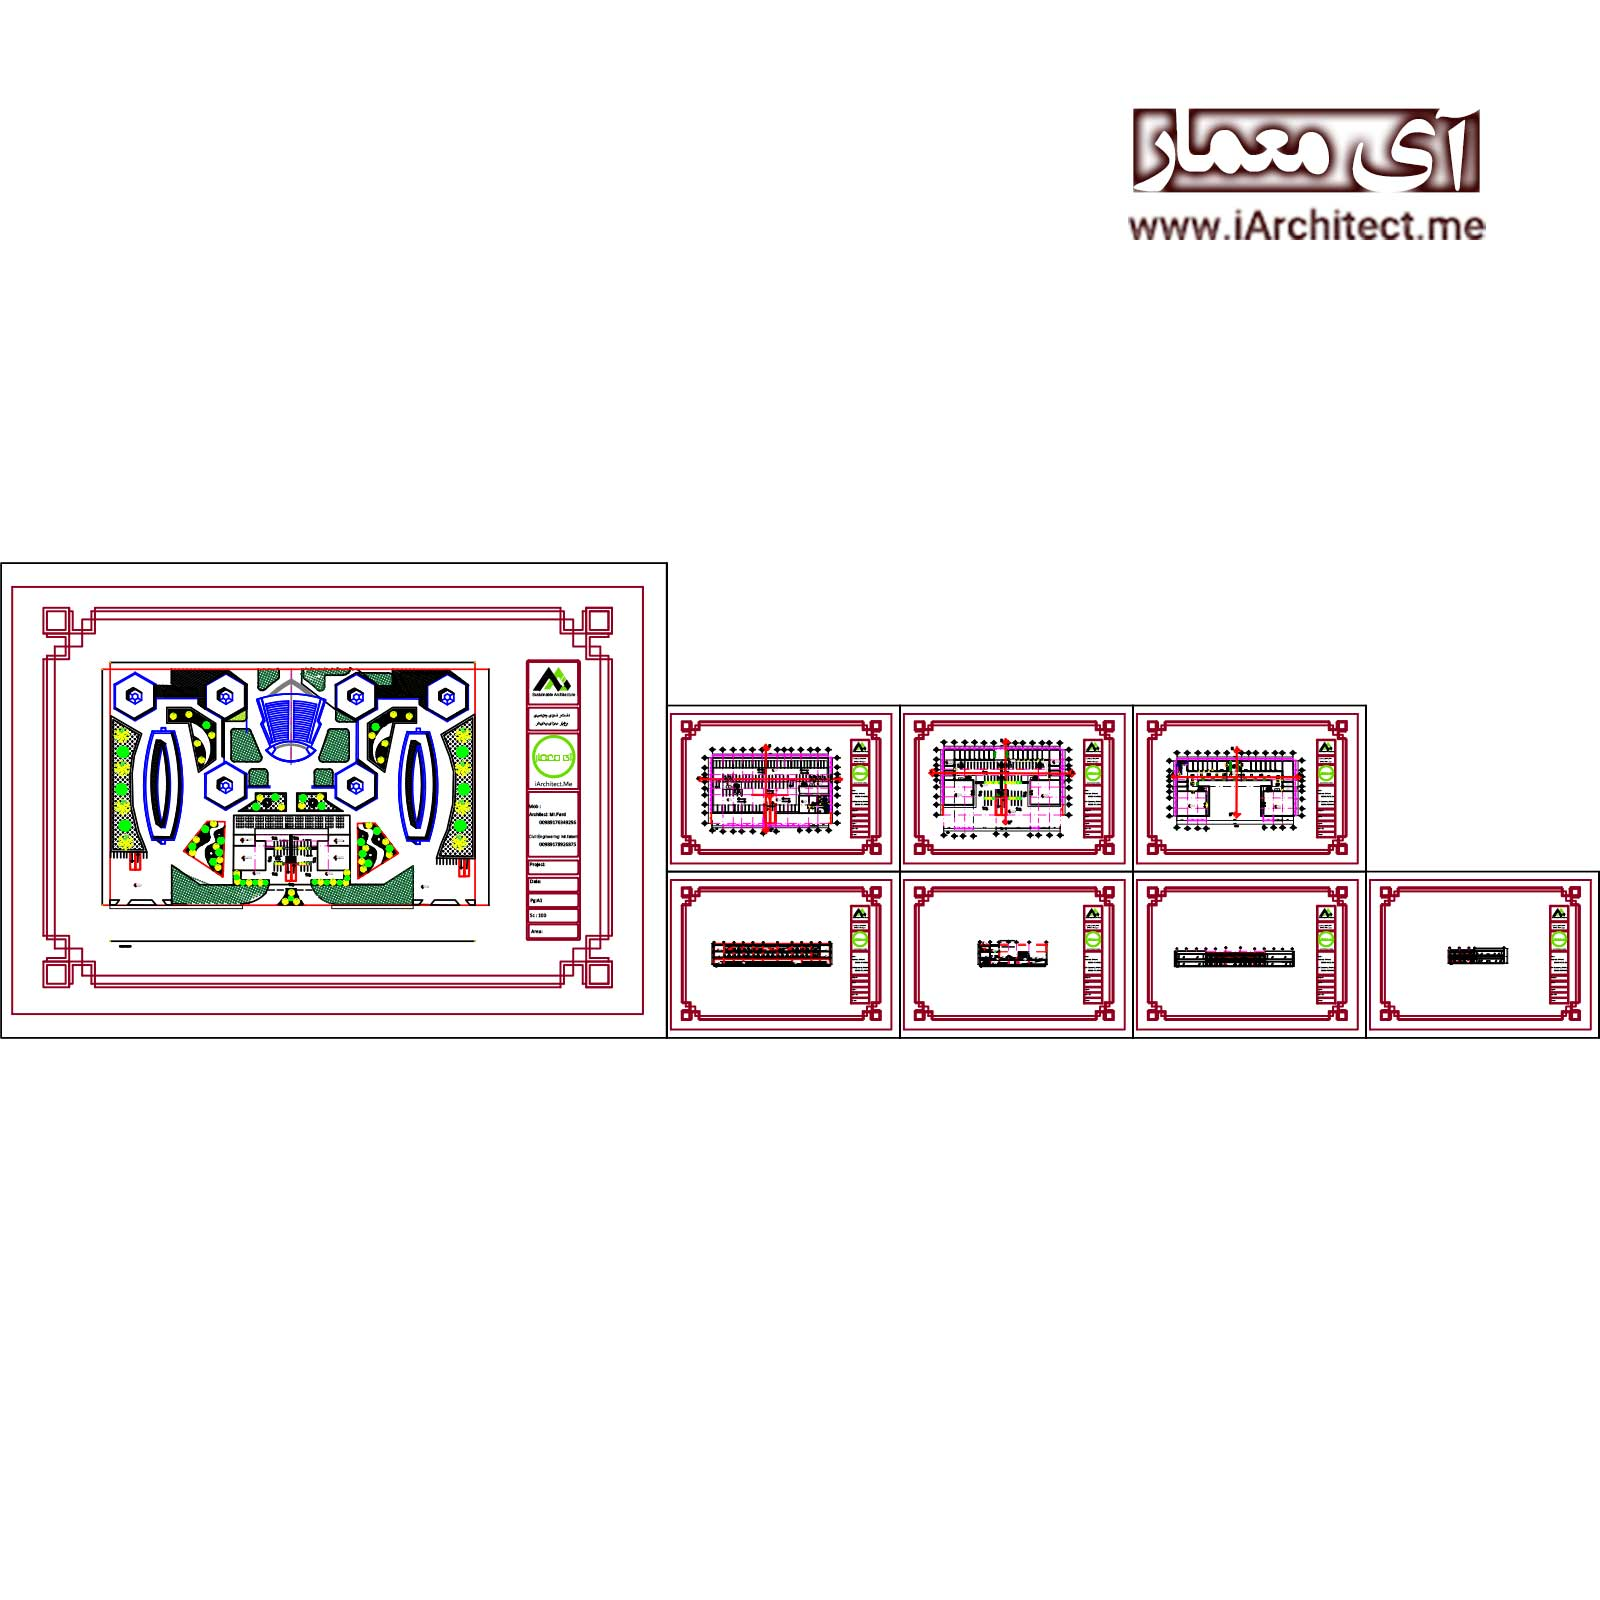 نقشه سالن کنفرانس